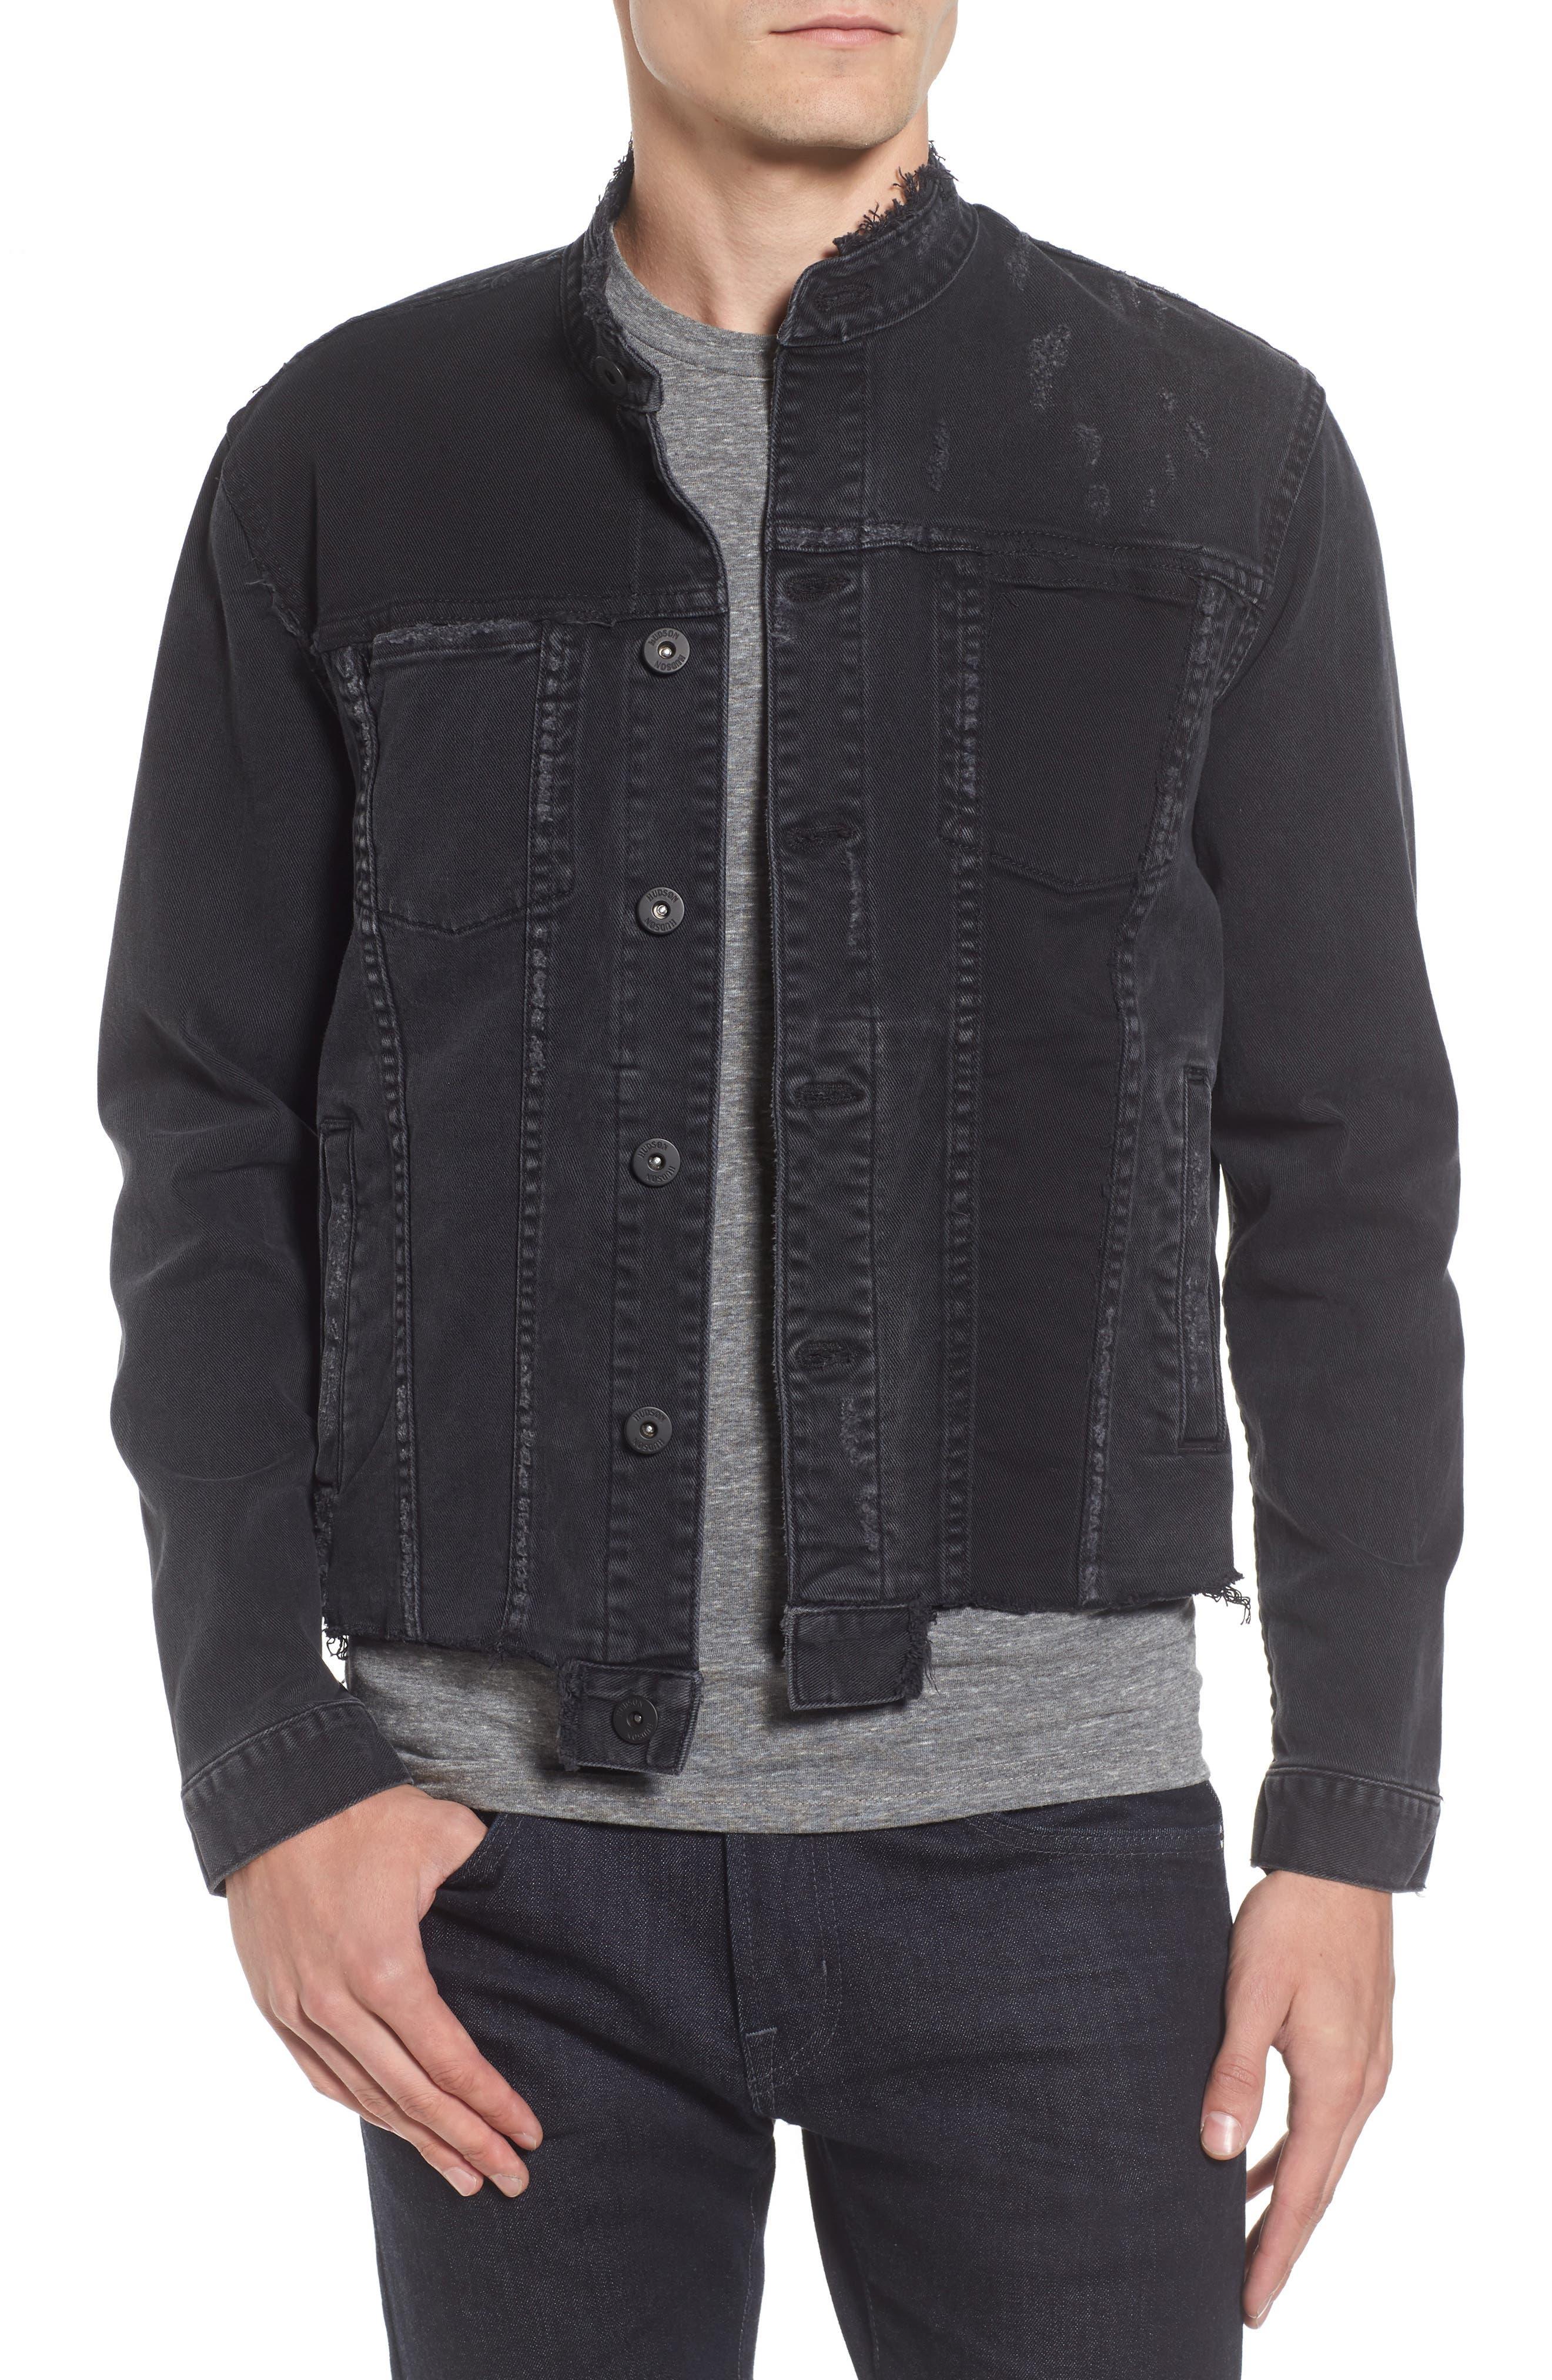 Alternate Image 1 Selected - Hudson Jeans Blaine Denim Jacket